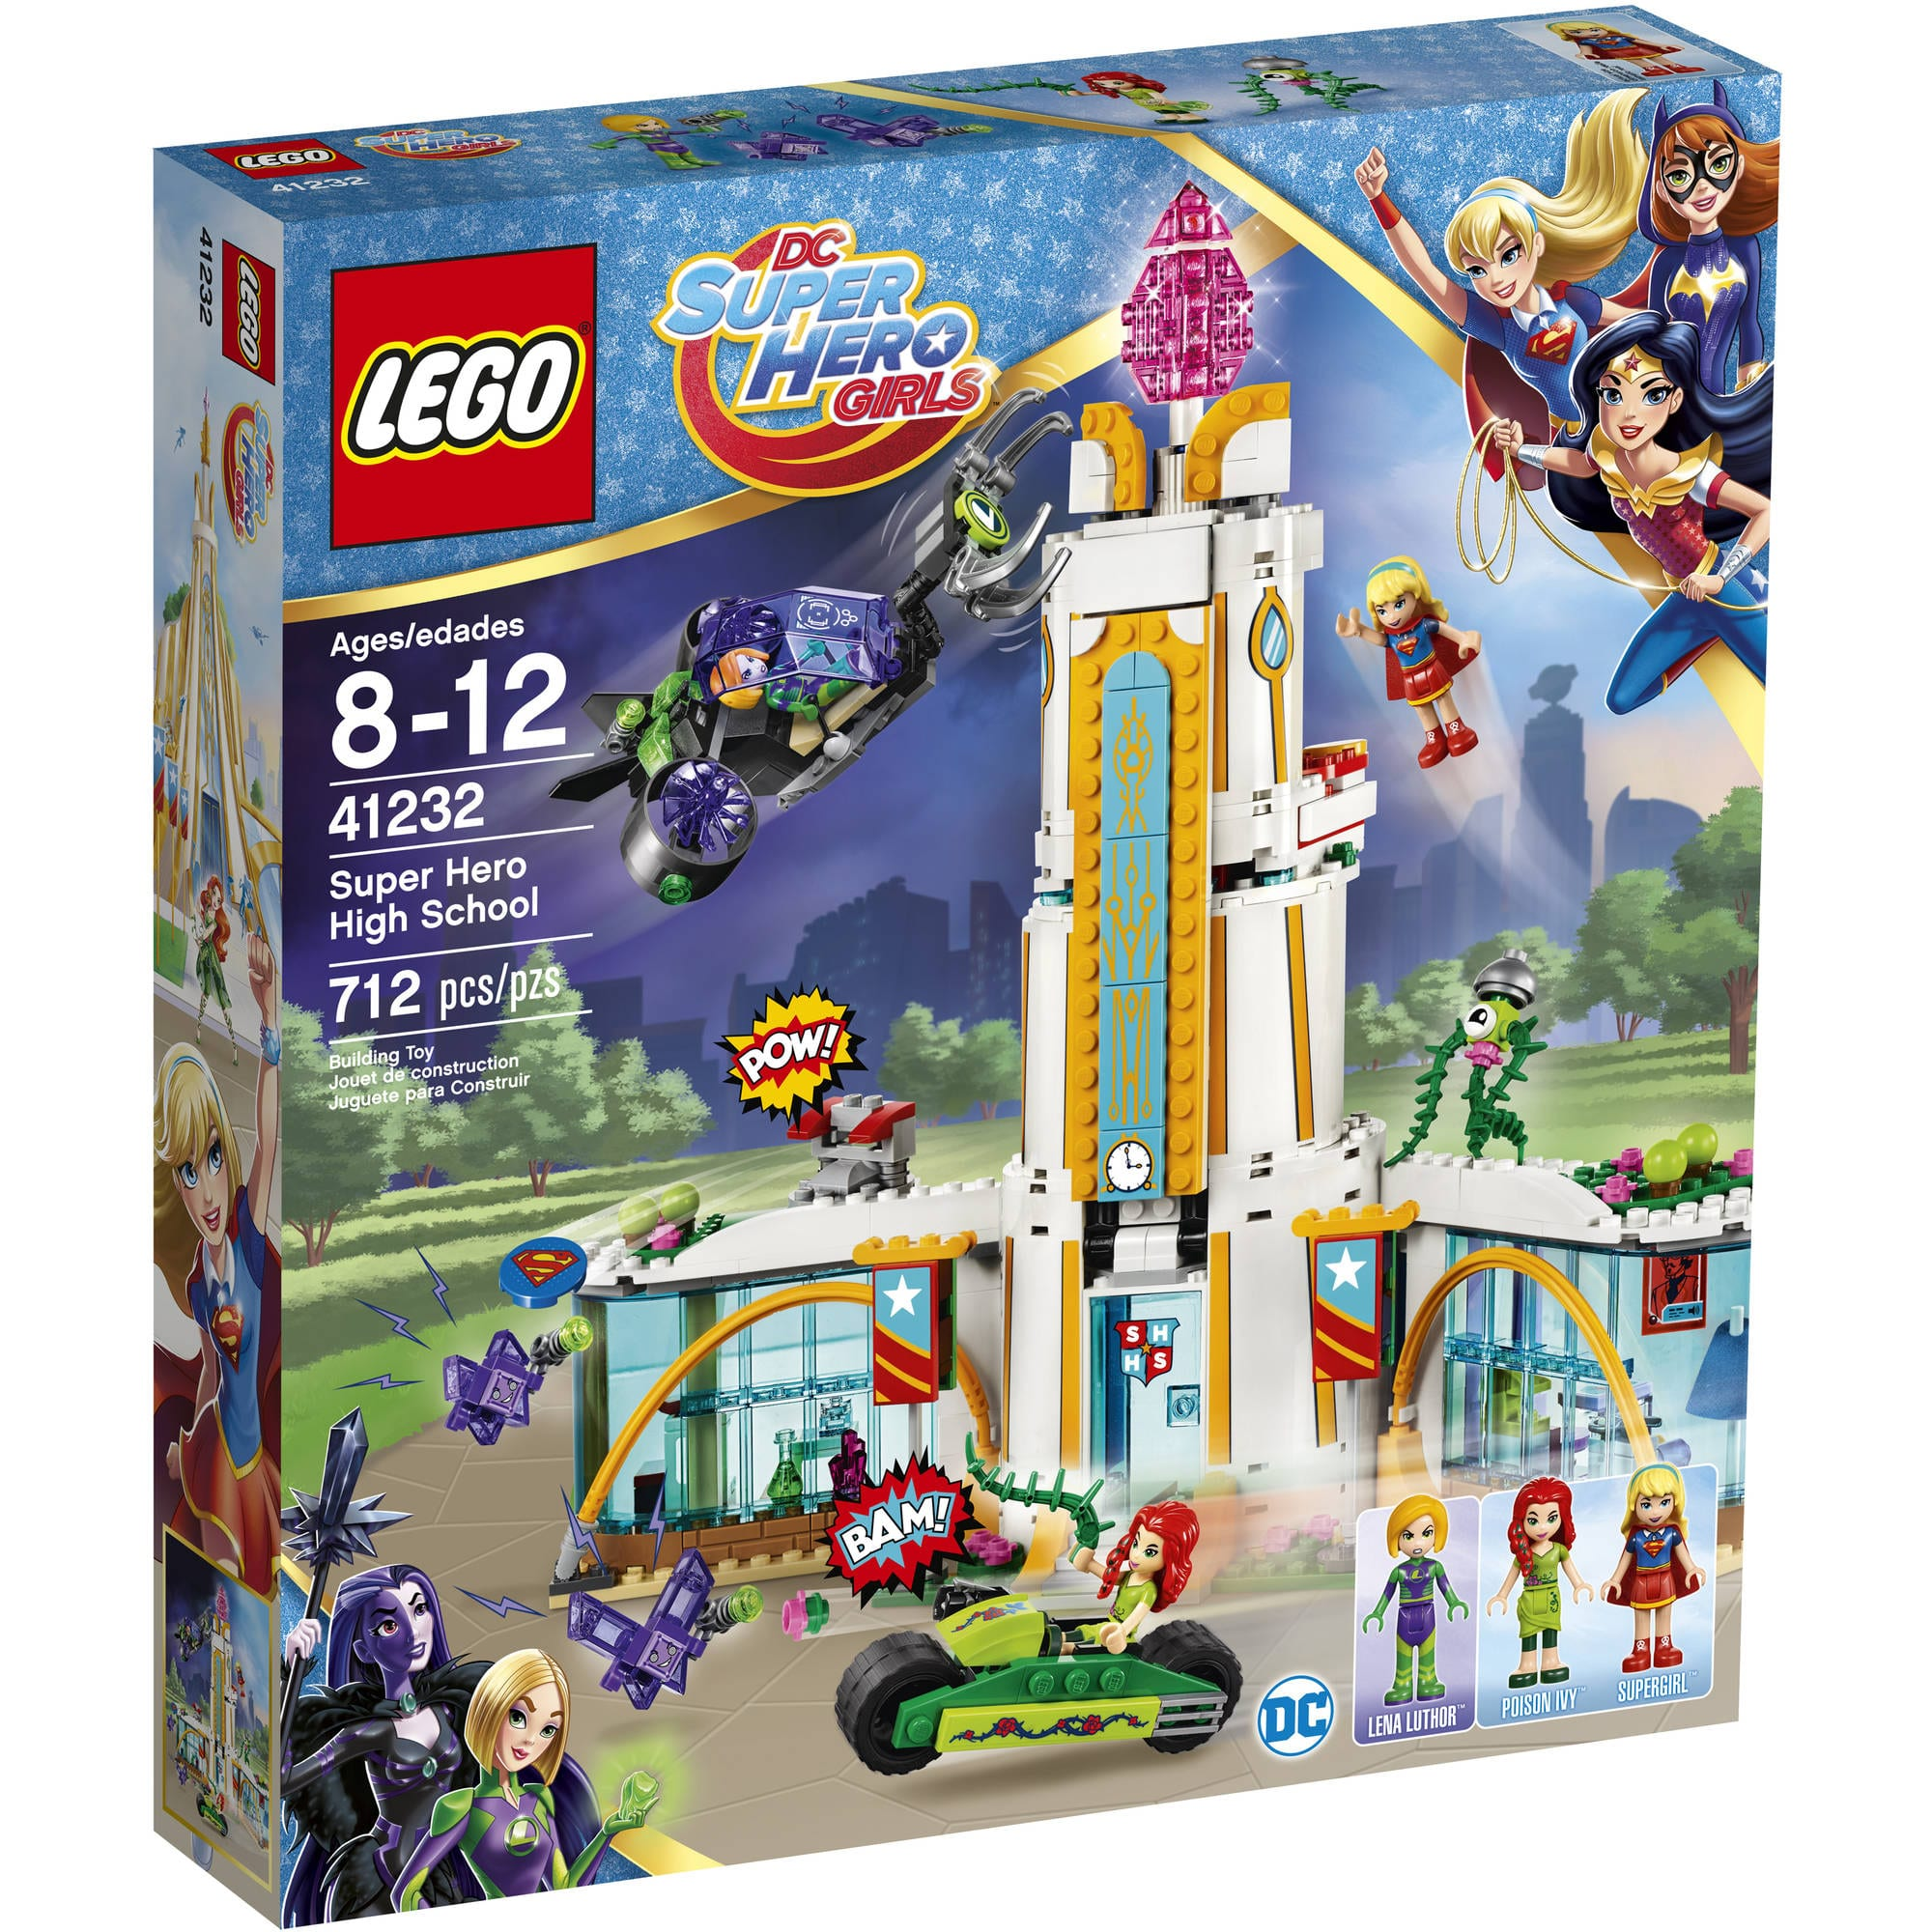 Lego DC Super Heros Girls Highschool $15 YMMV at Walmart B&M and other deals